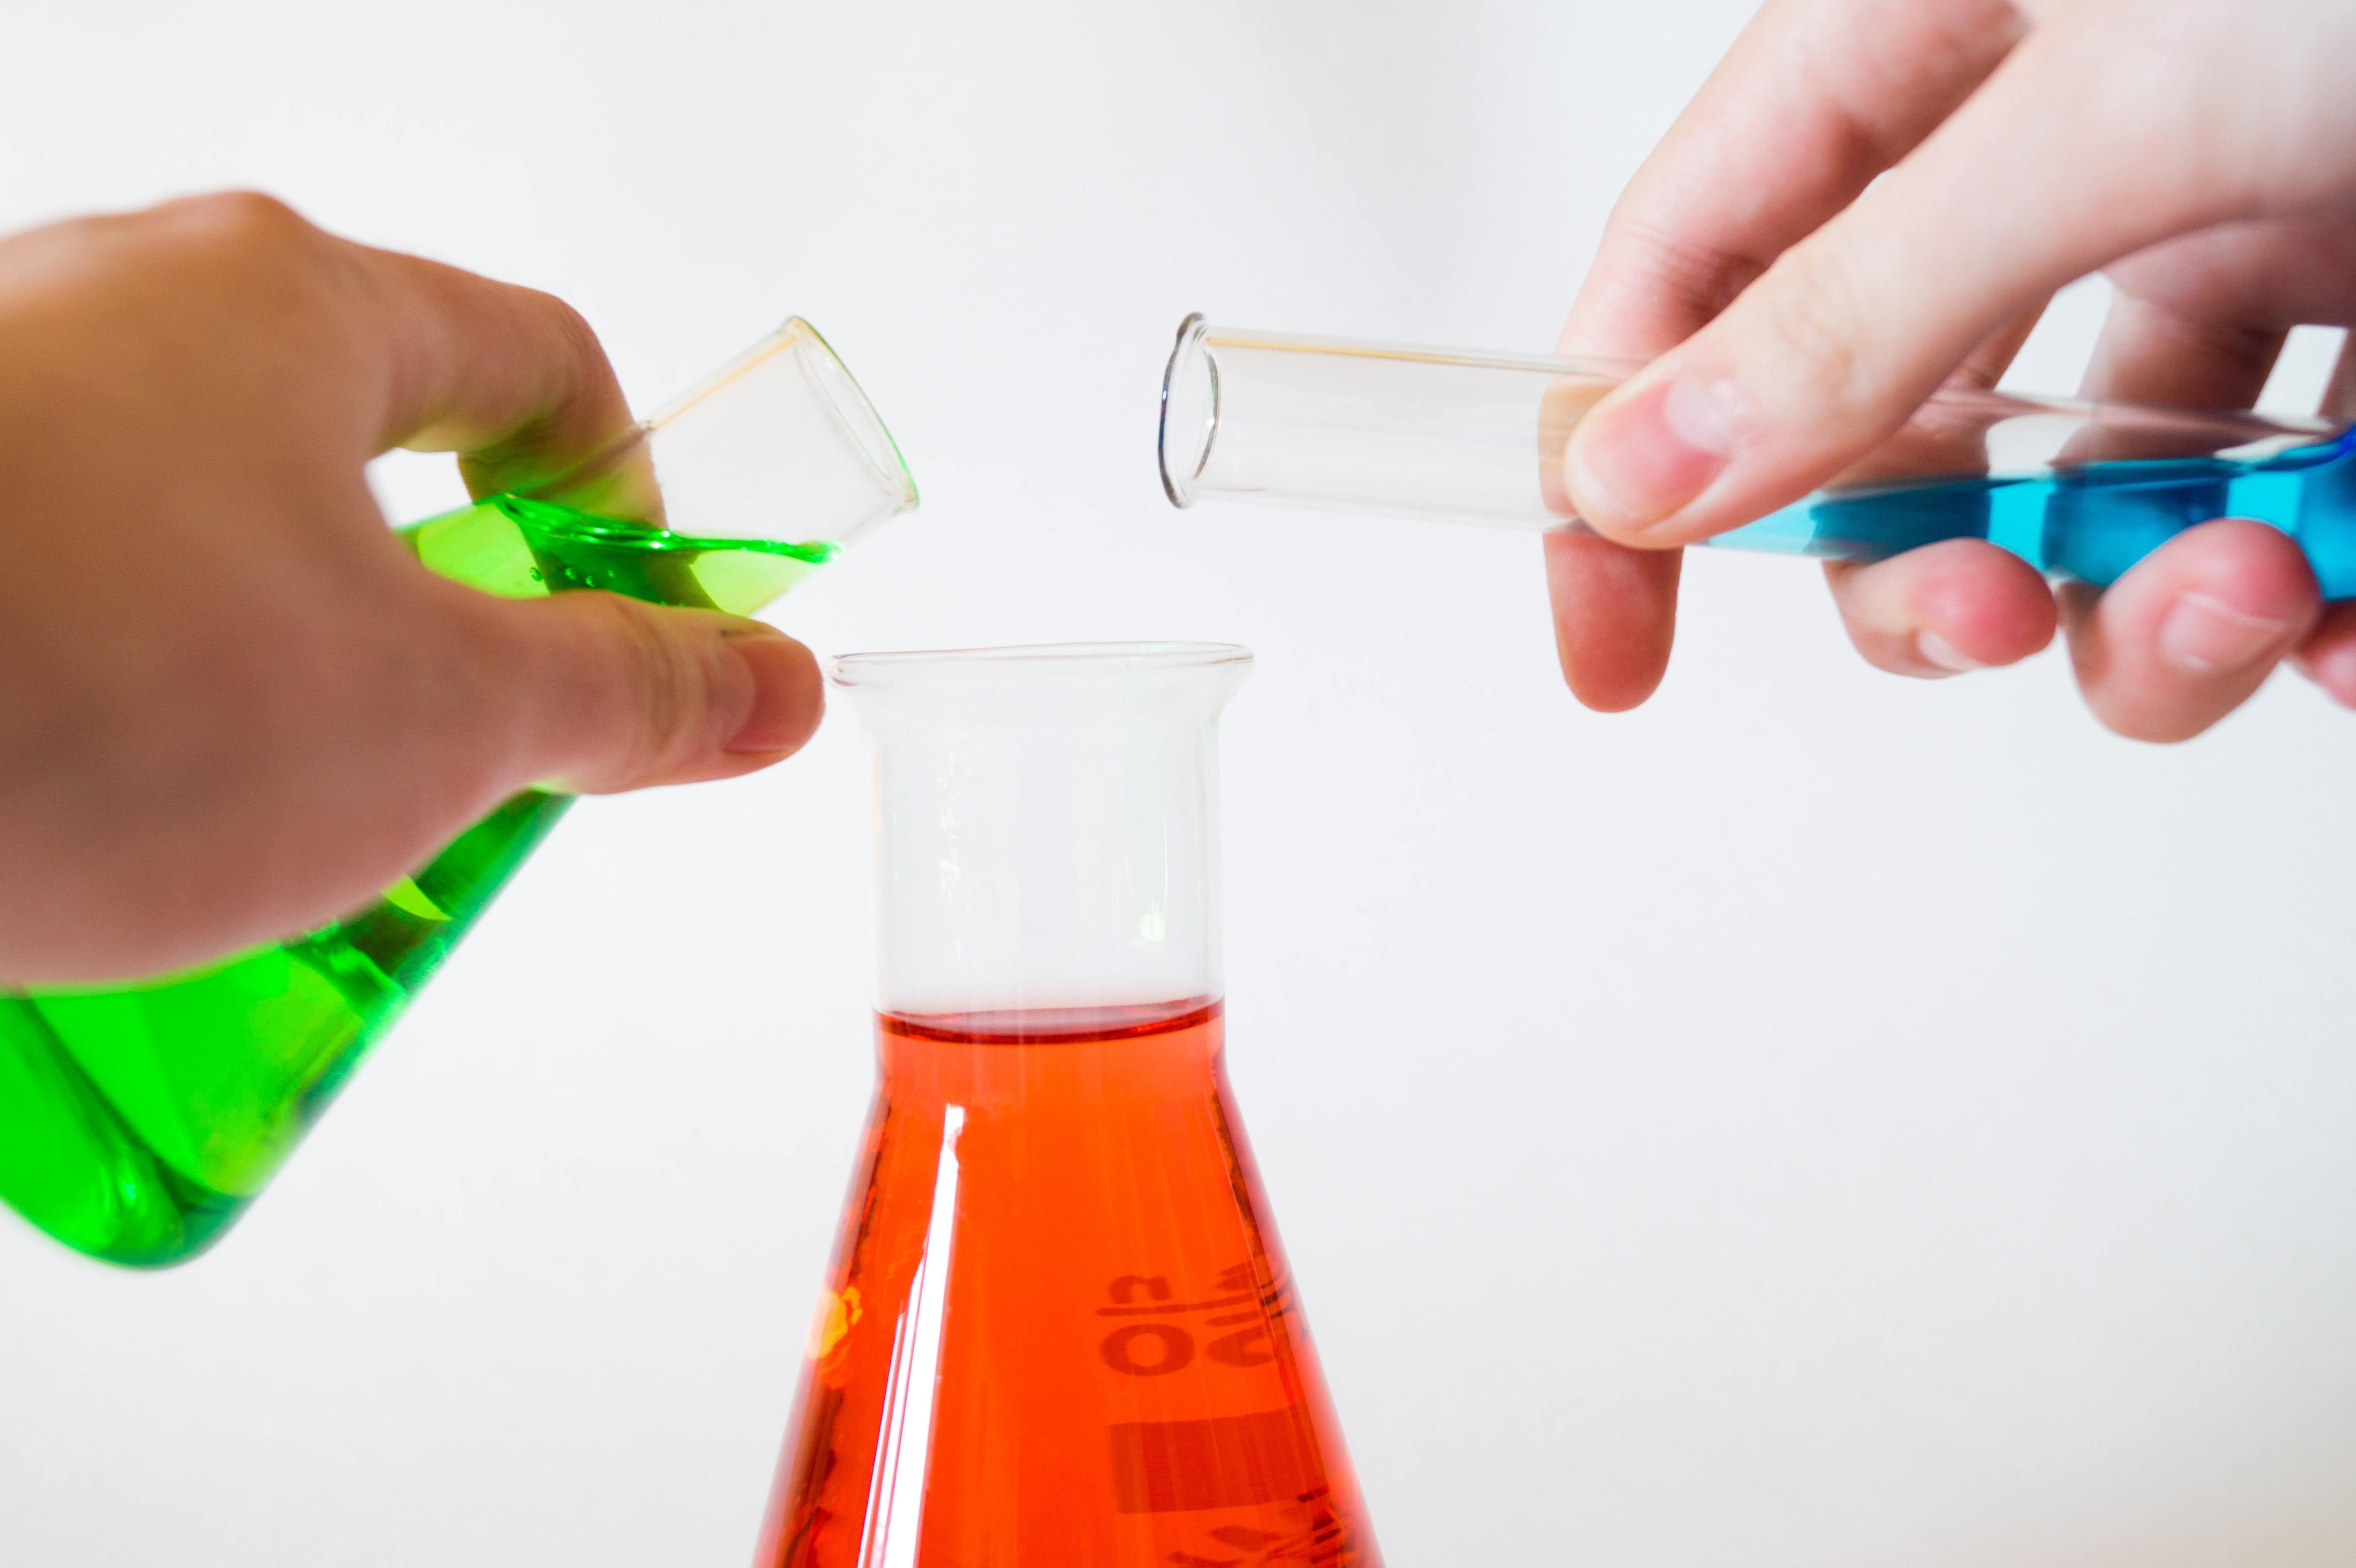 Hands holding laboratory flasks